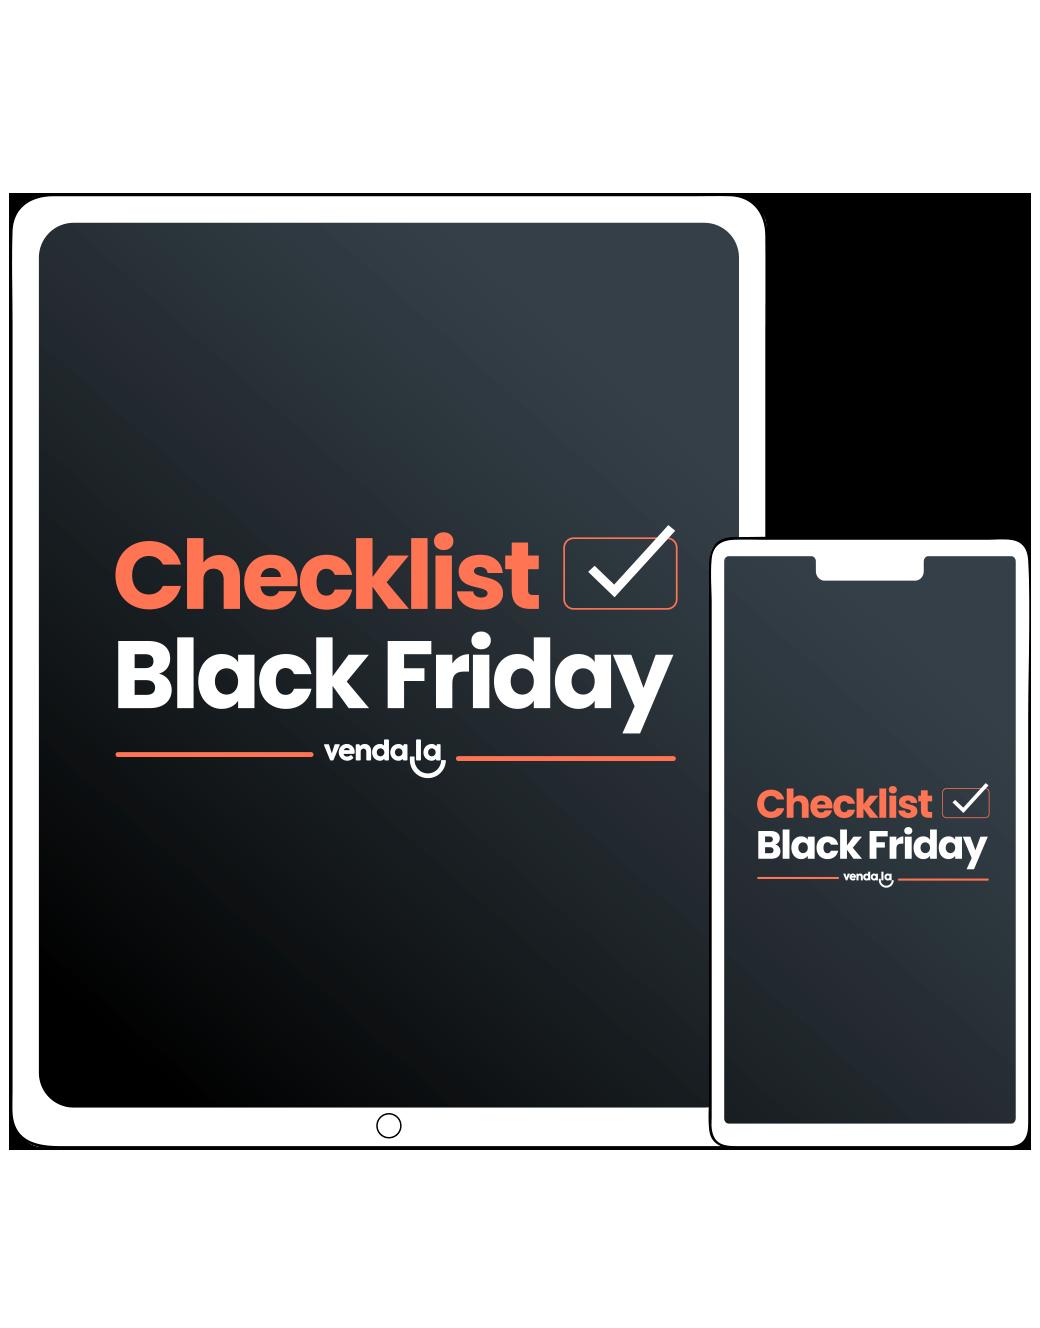 Checklist Black Friday